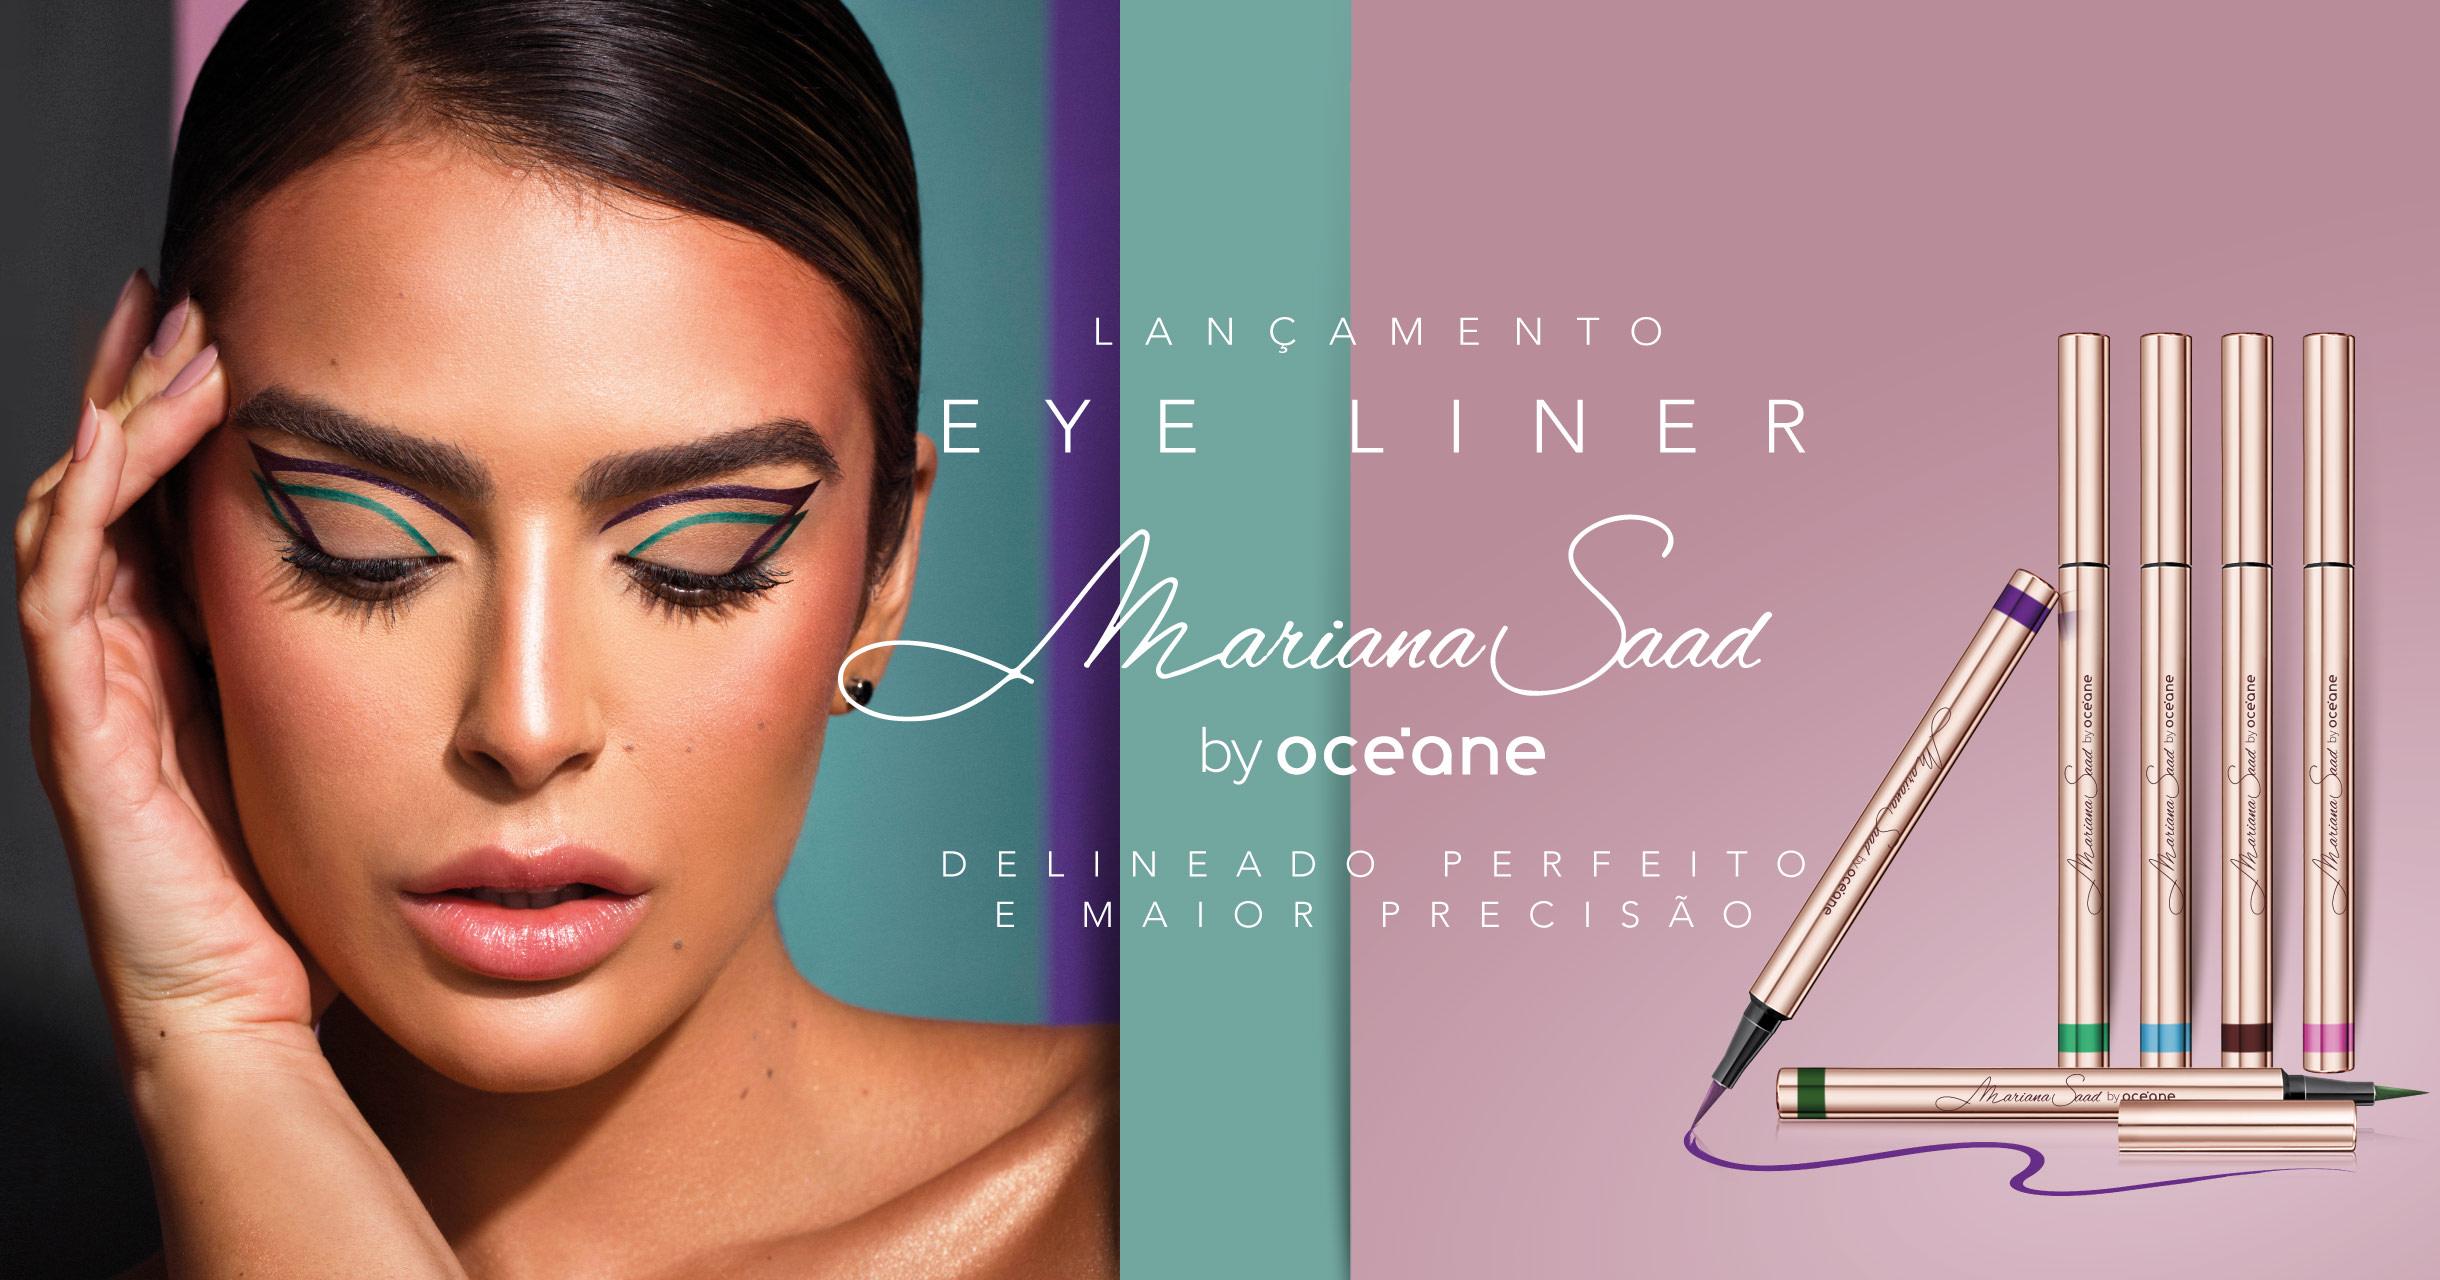 Lançamento Mariana Saad